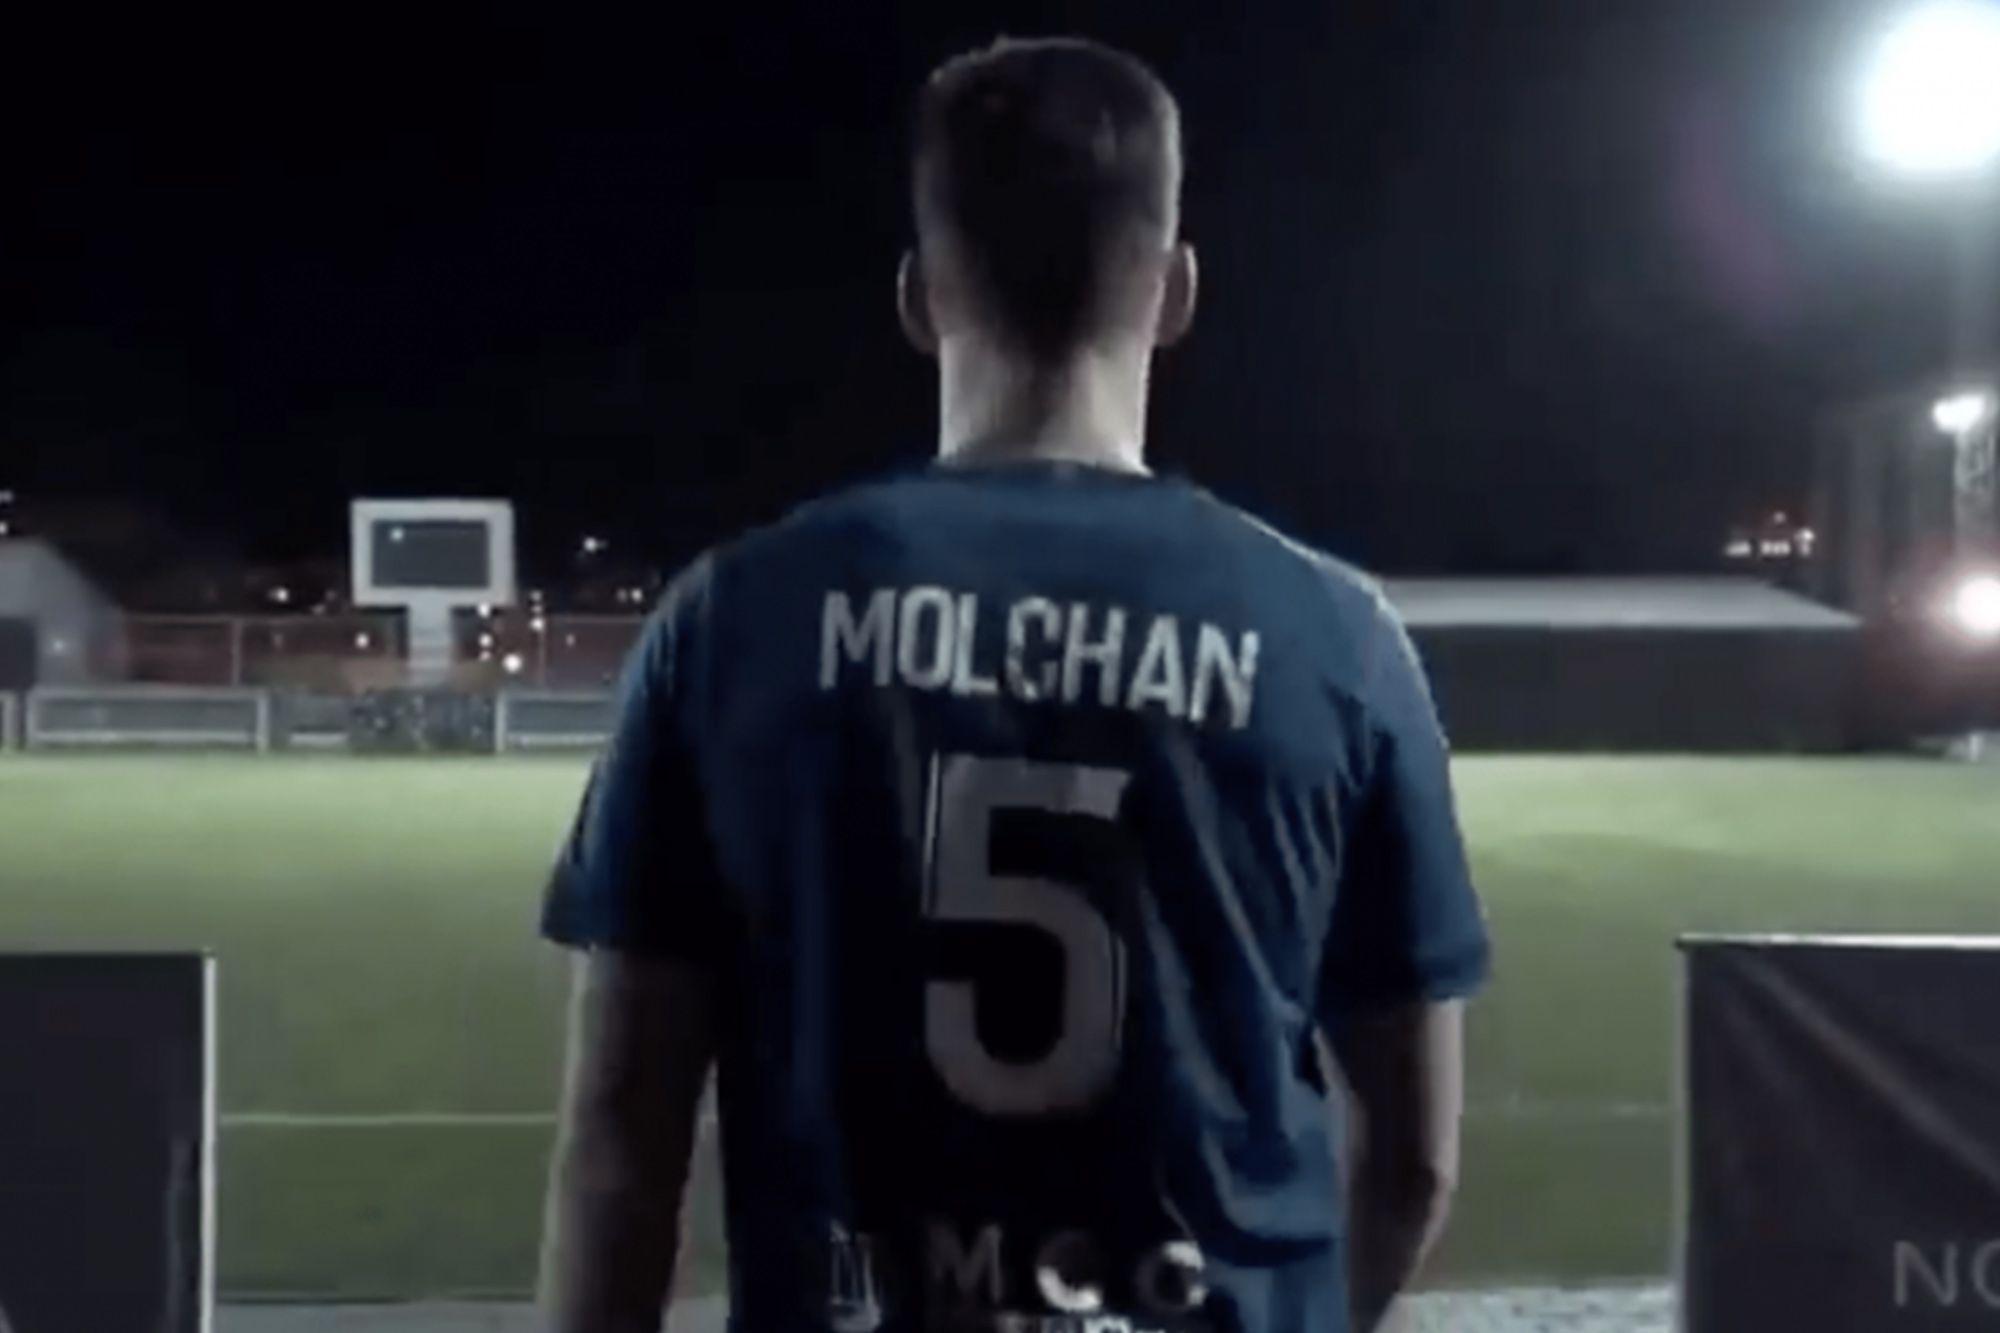 La recrue Vladislav Molchan arrive à Caen ce week-end